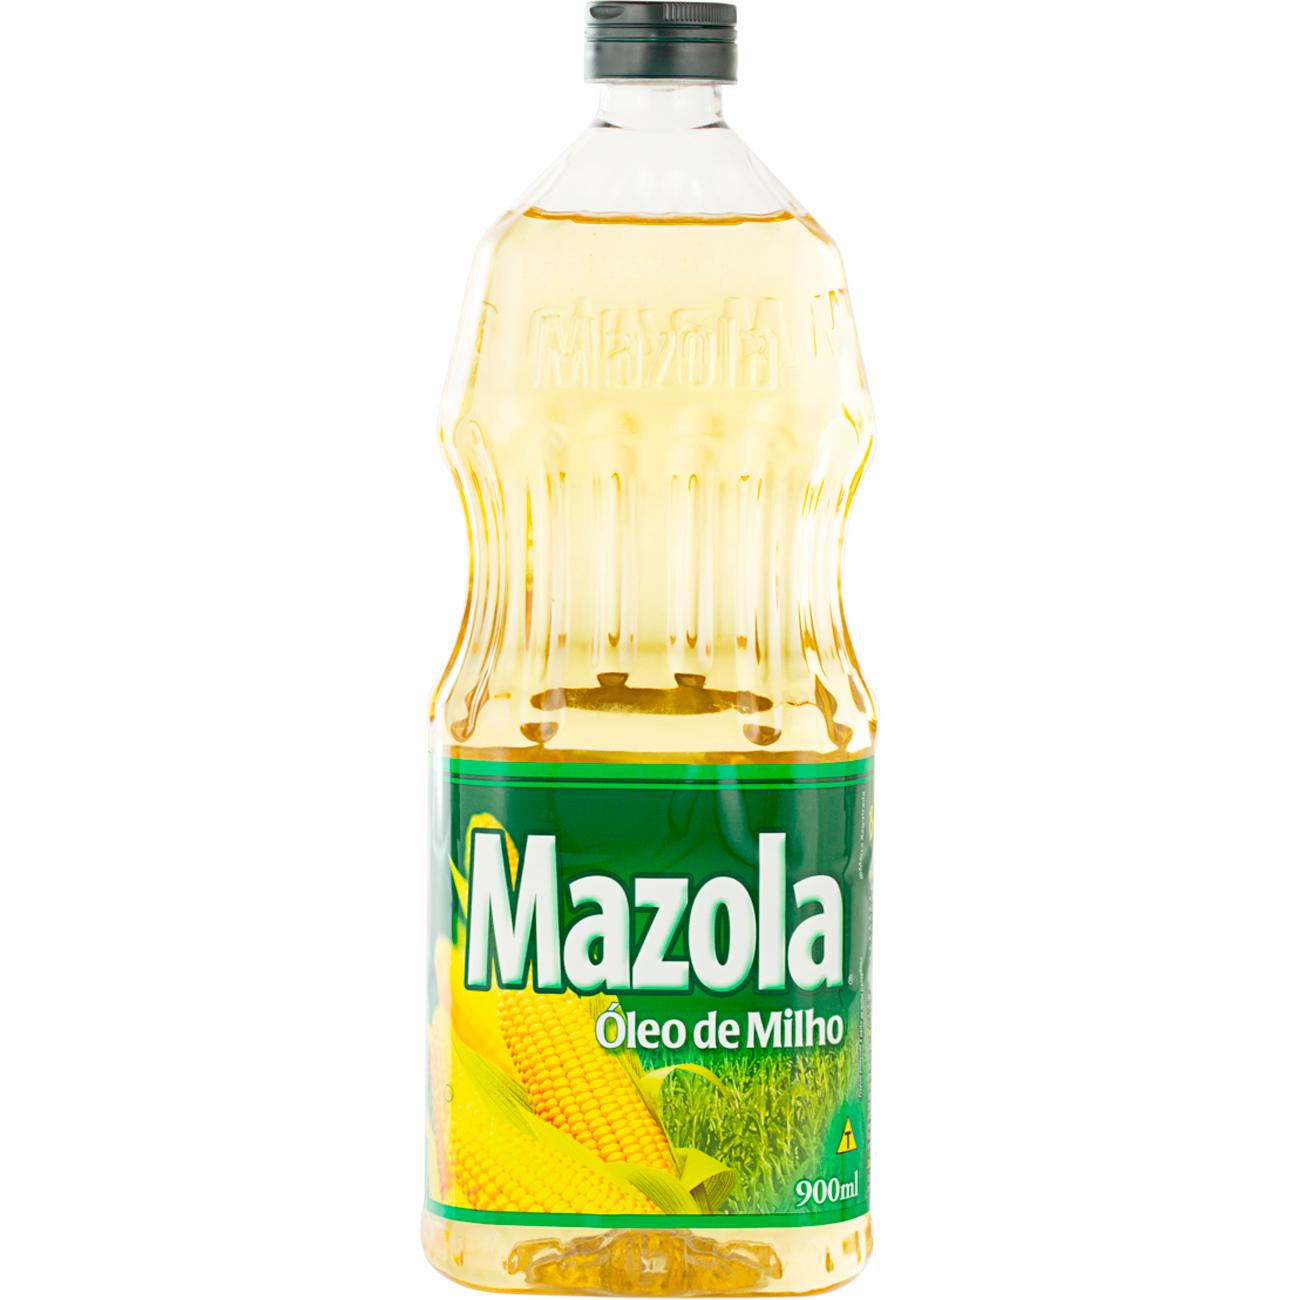 Oleo De Milho Mazola 900ml